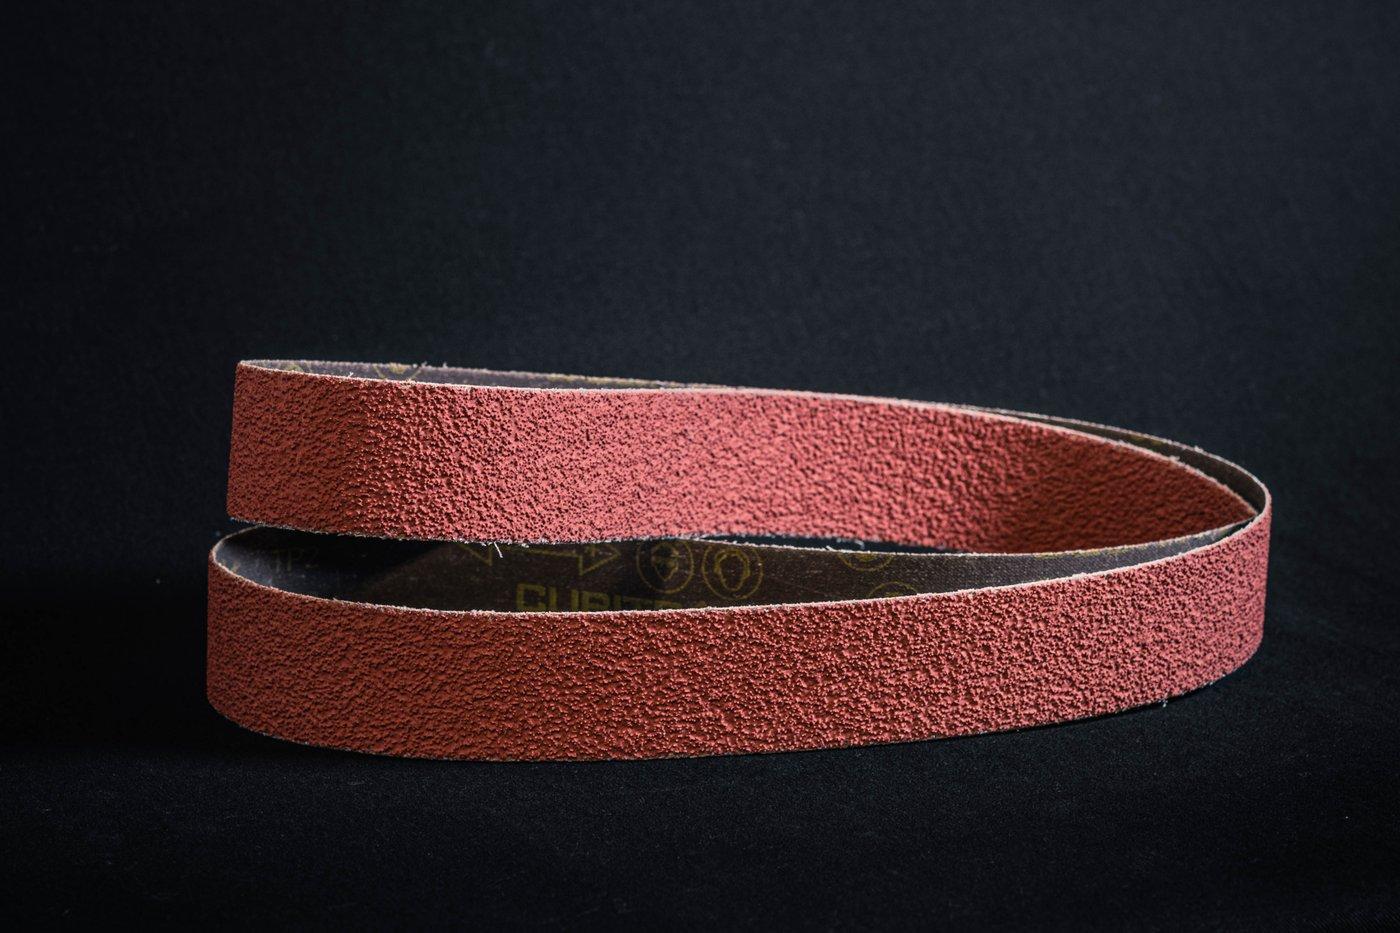 3M Cubitron 984F II Cermaic Belt